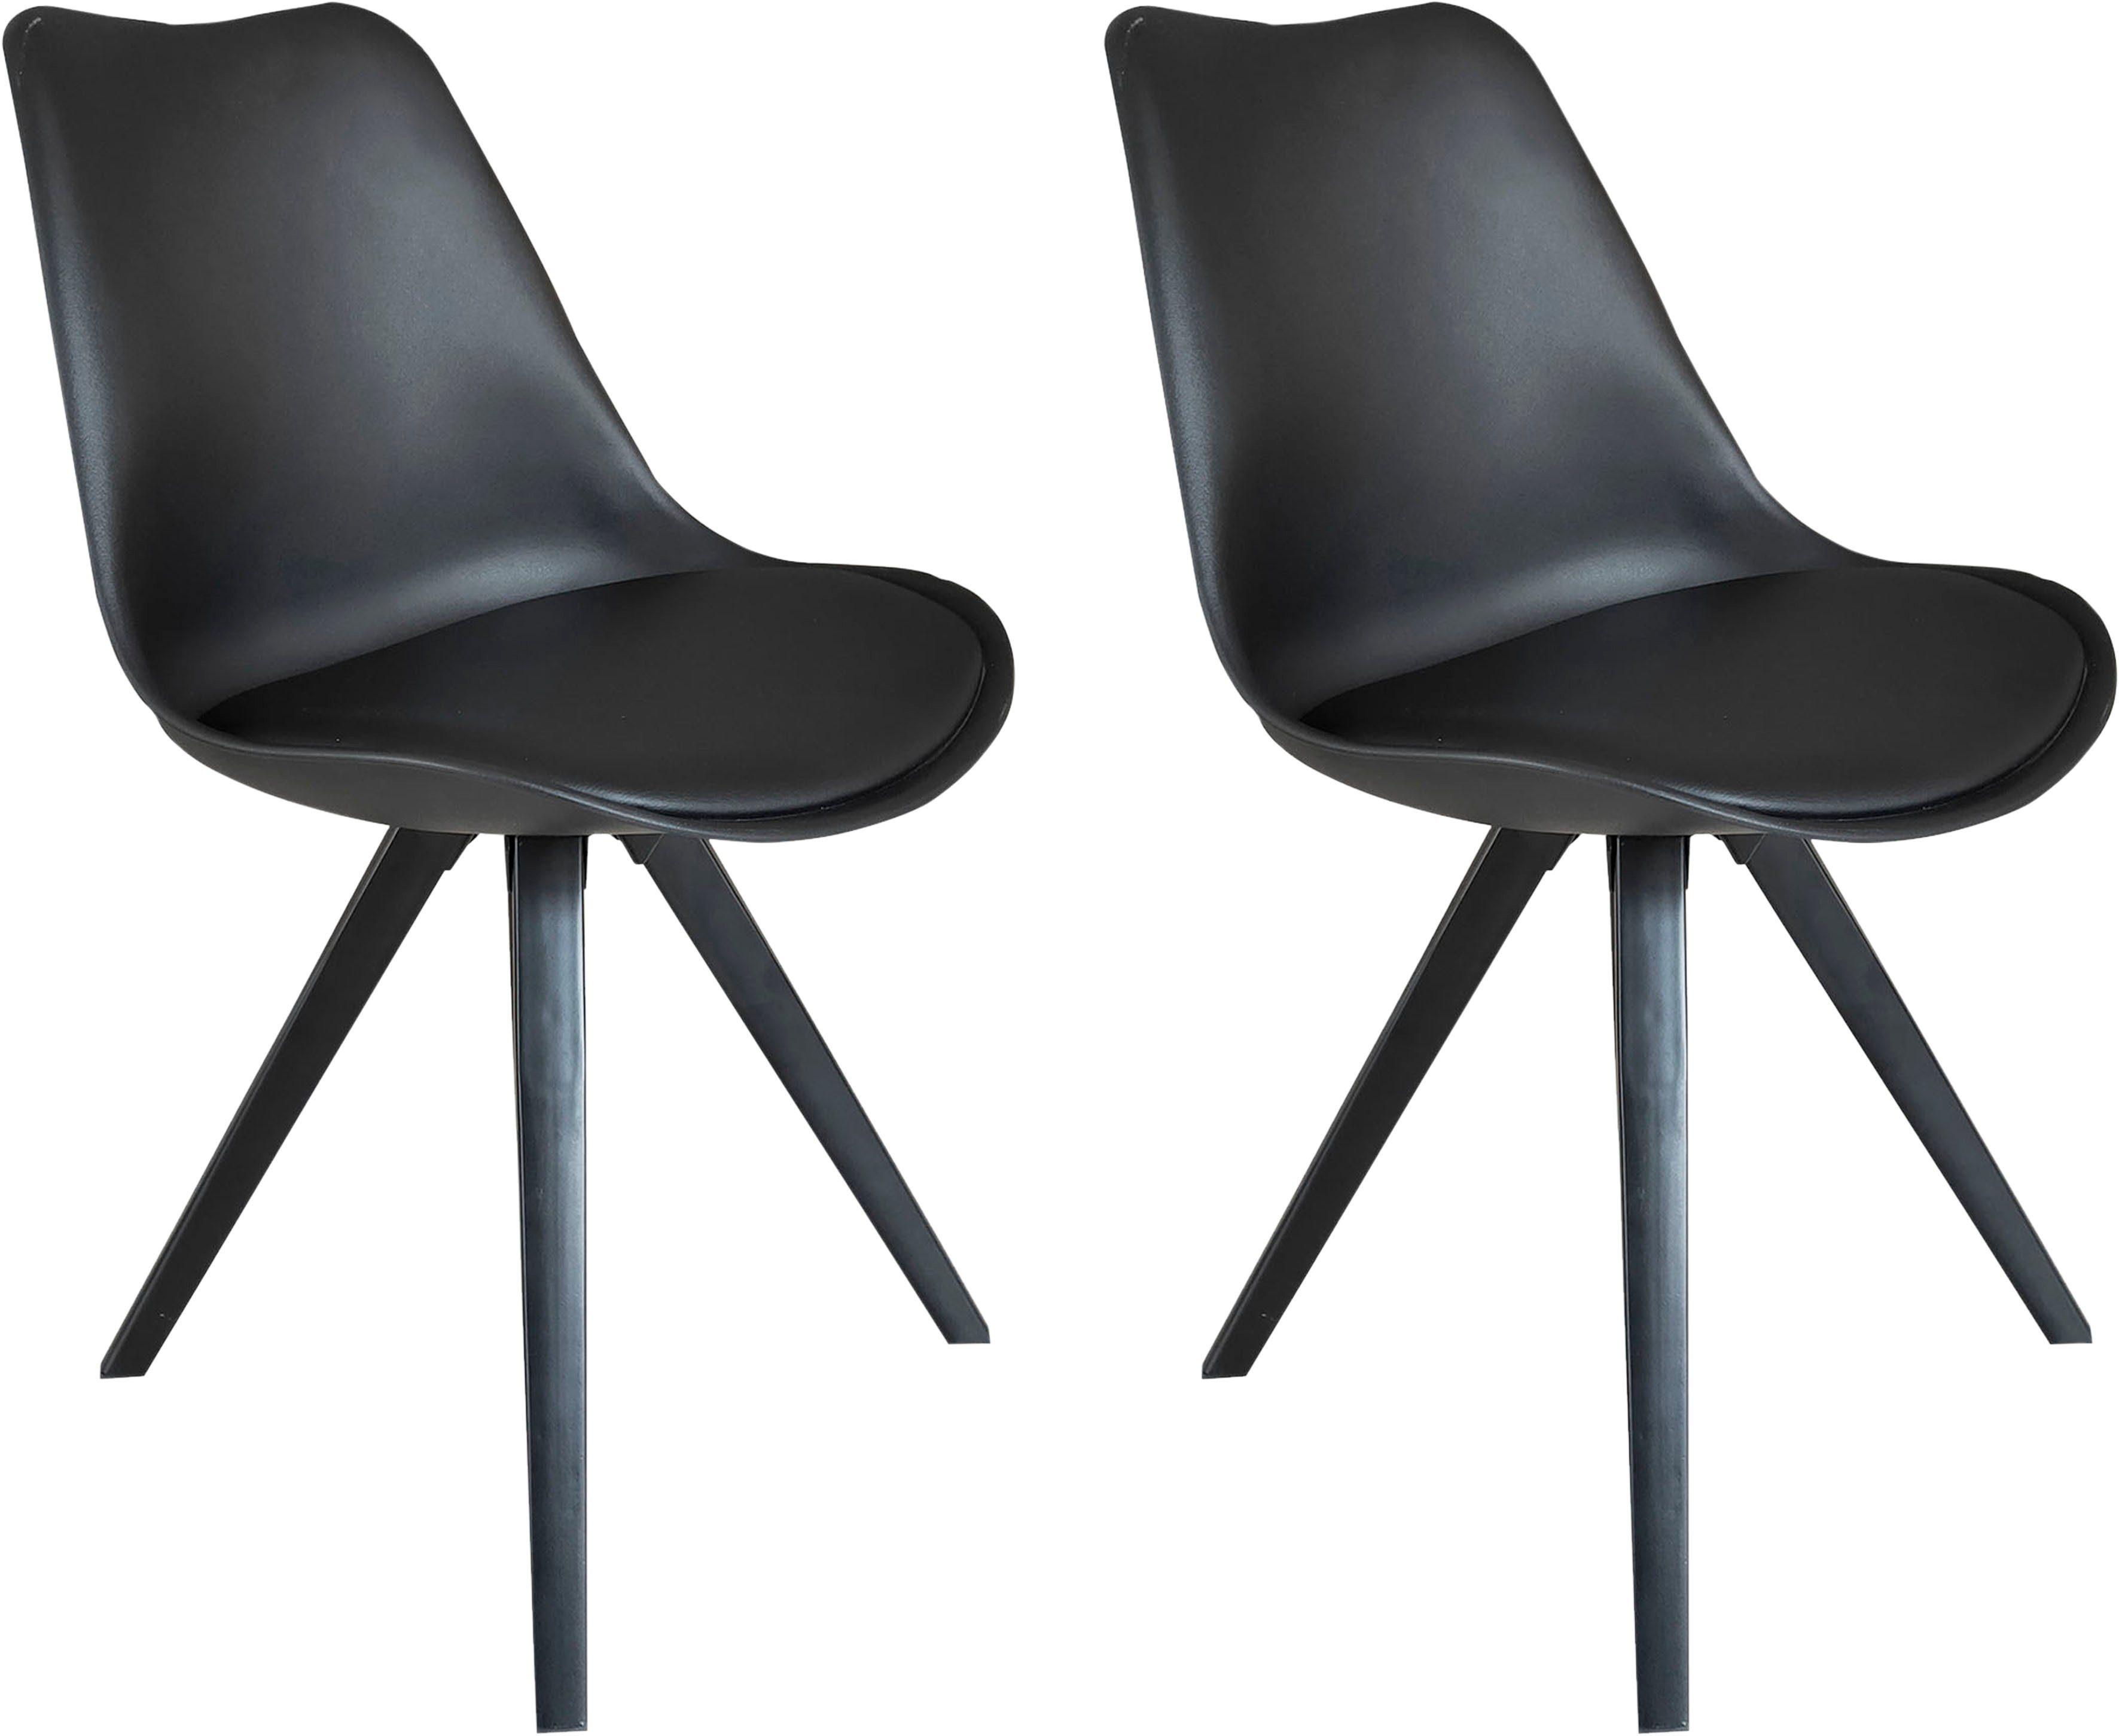 Homexperts 4 Fußstuhl »Kaja 02« (2 Stück), Sitzschale mit Sitzfläche in Lederoptik online kaufen | OTTO